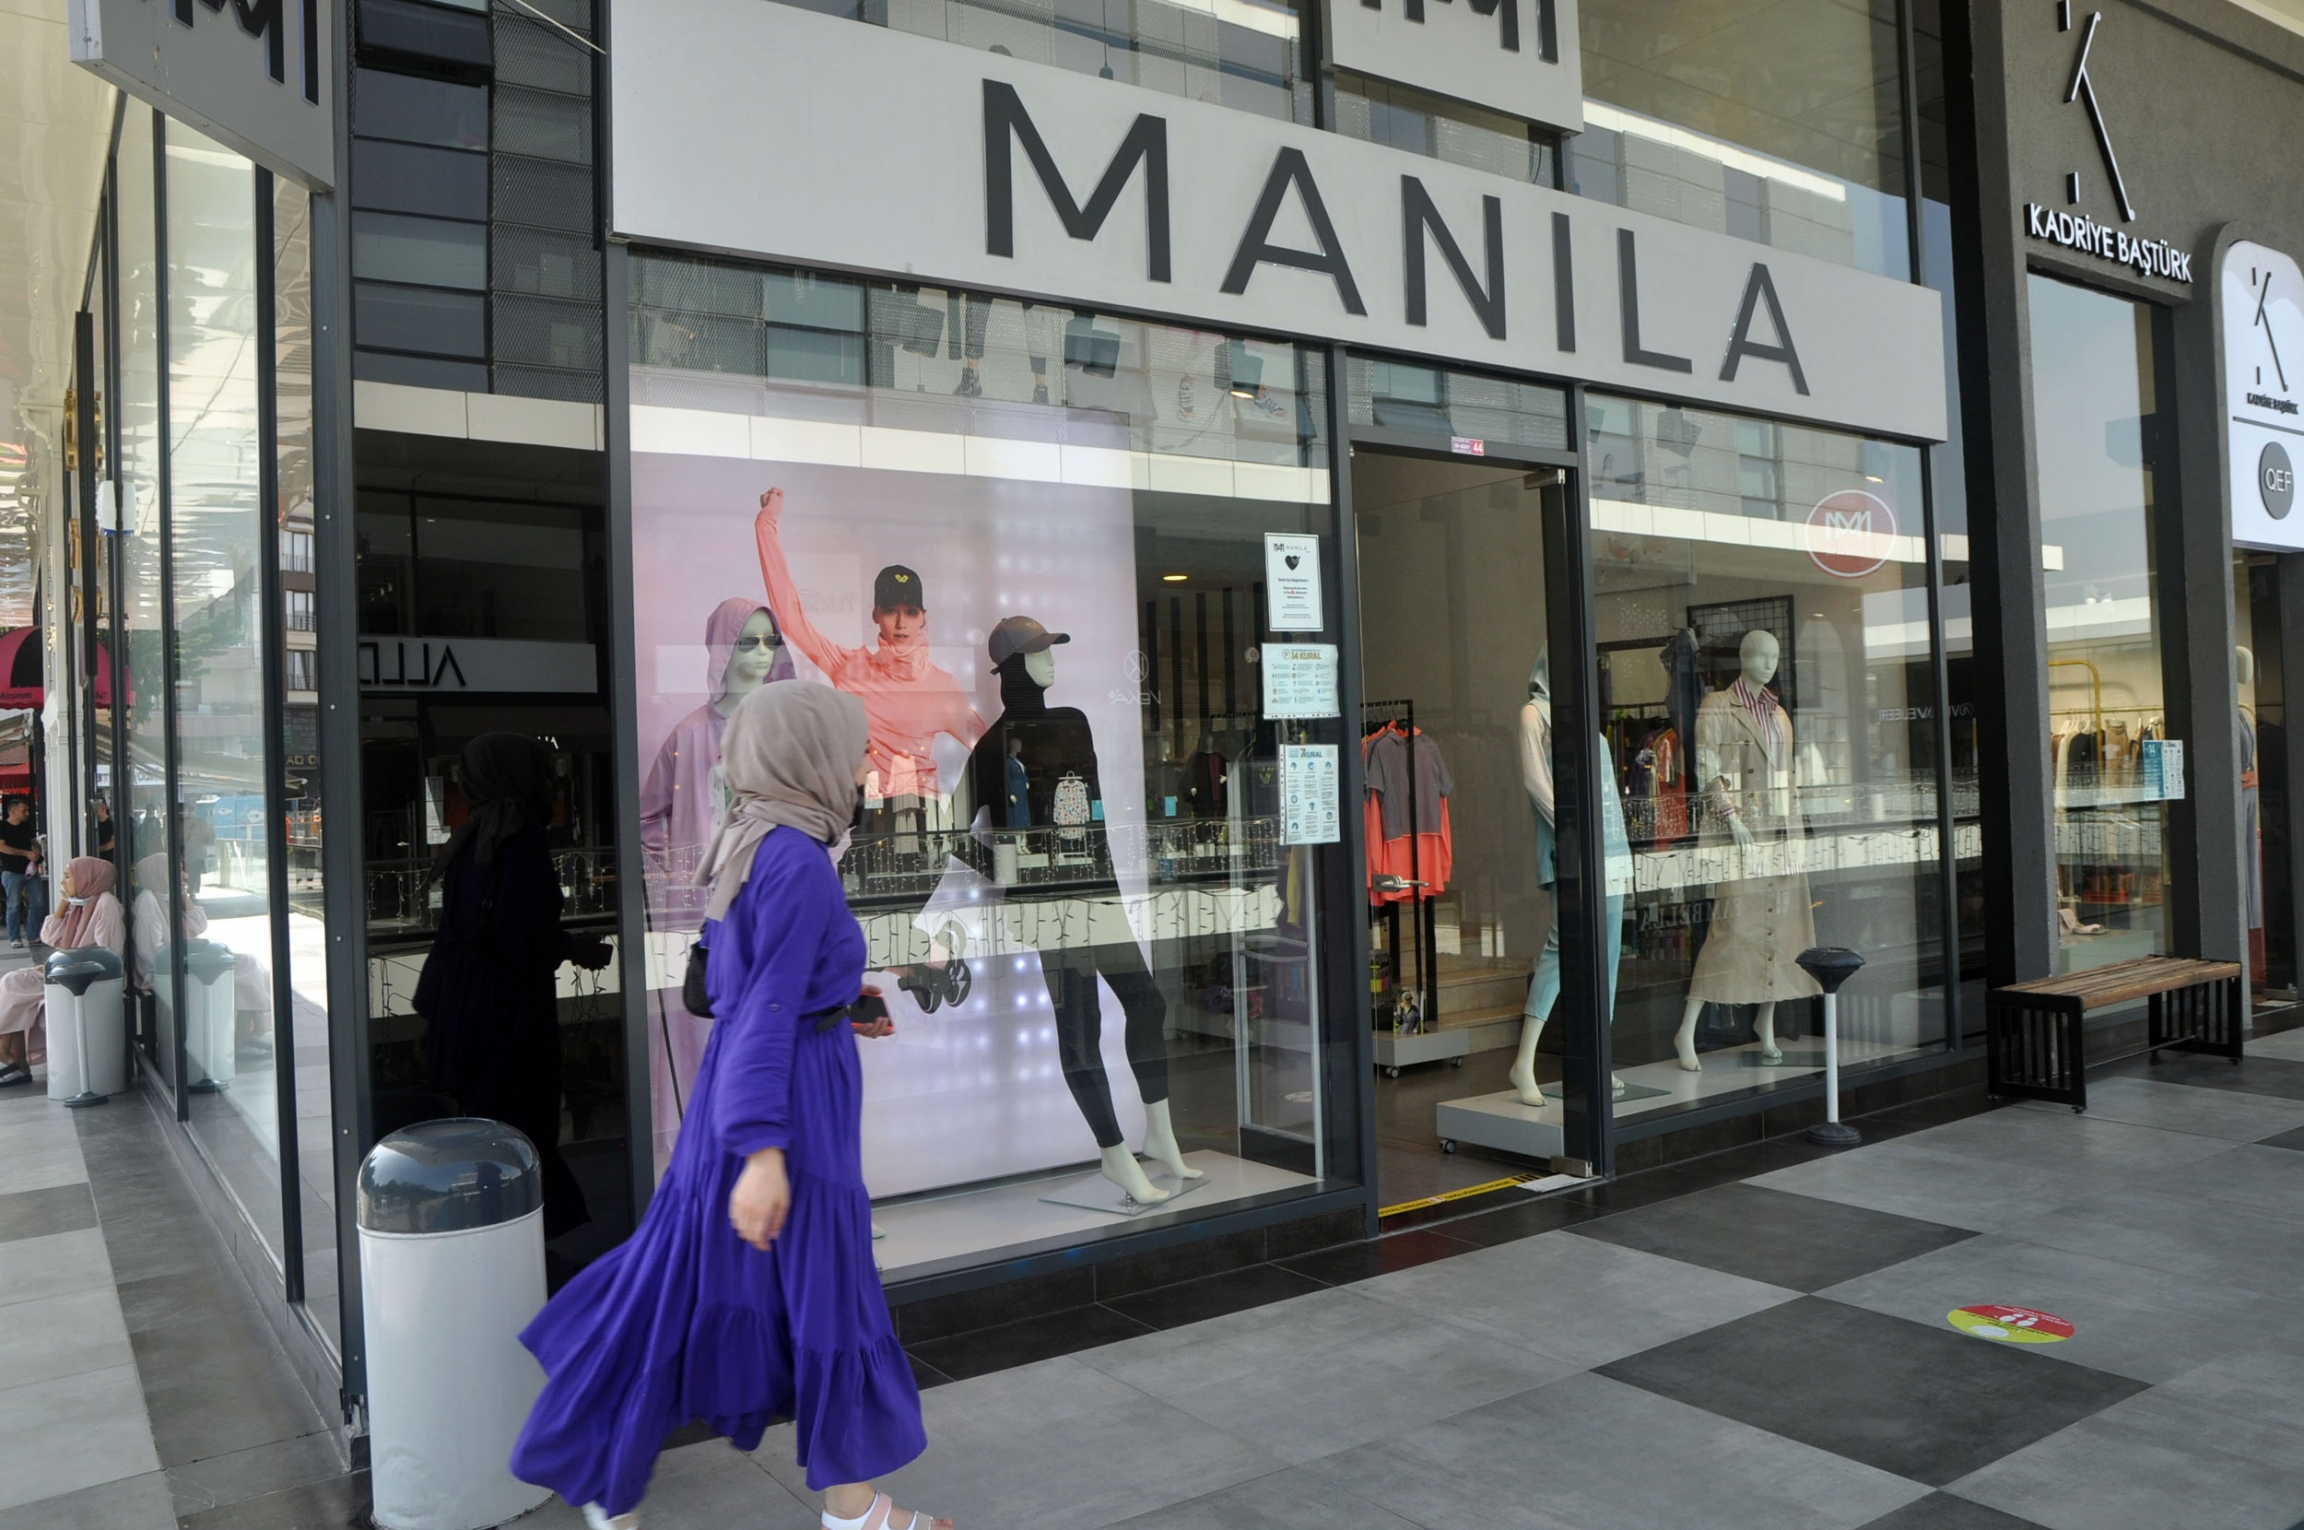 Manila is a sportswear company in Turkey that sells a swimwear hijab.